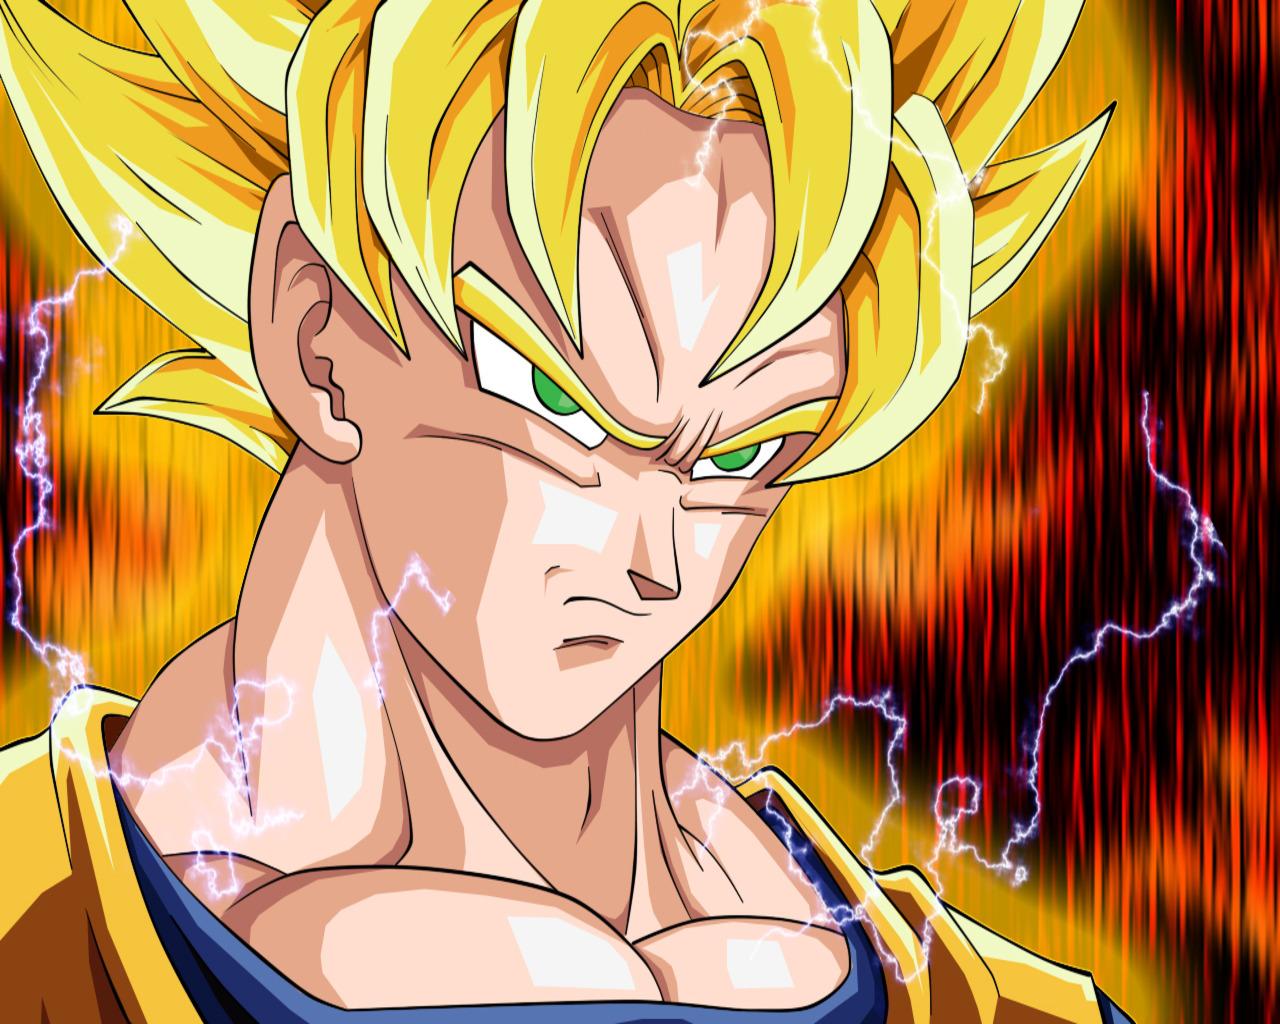 Free Download Super Saiyan Goku Wallpaper Forwallpapercom